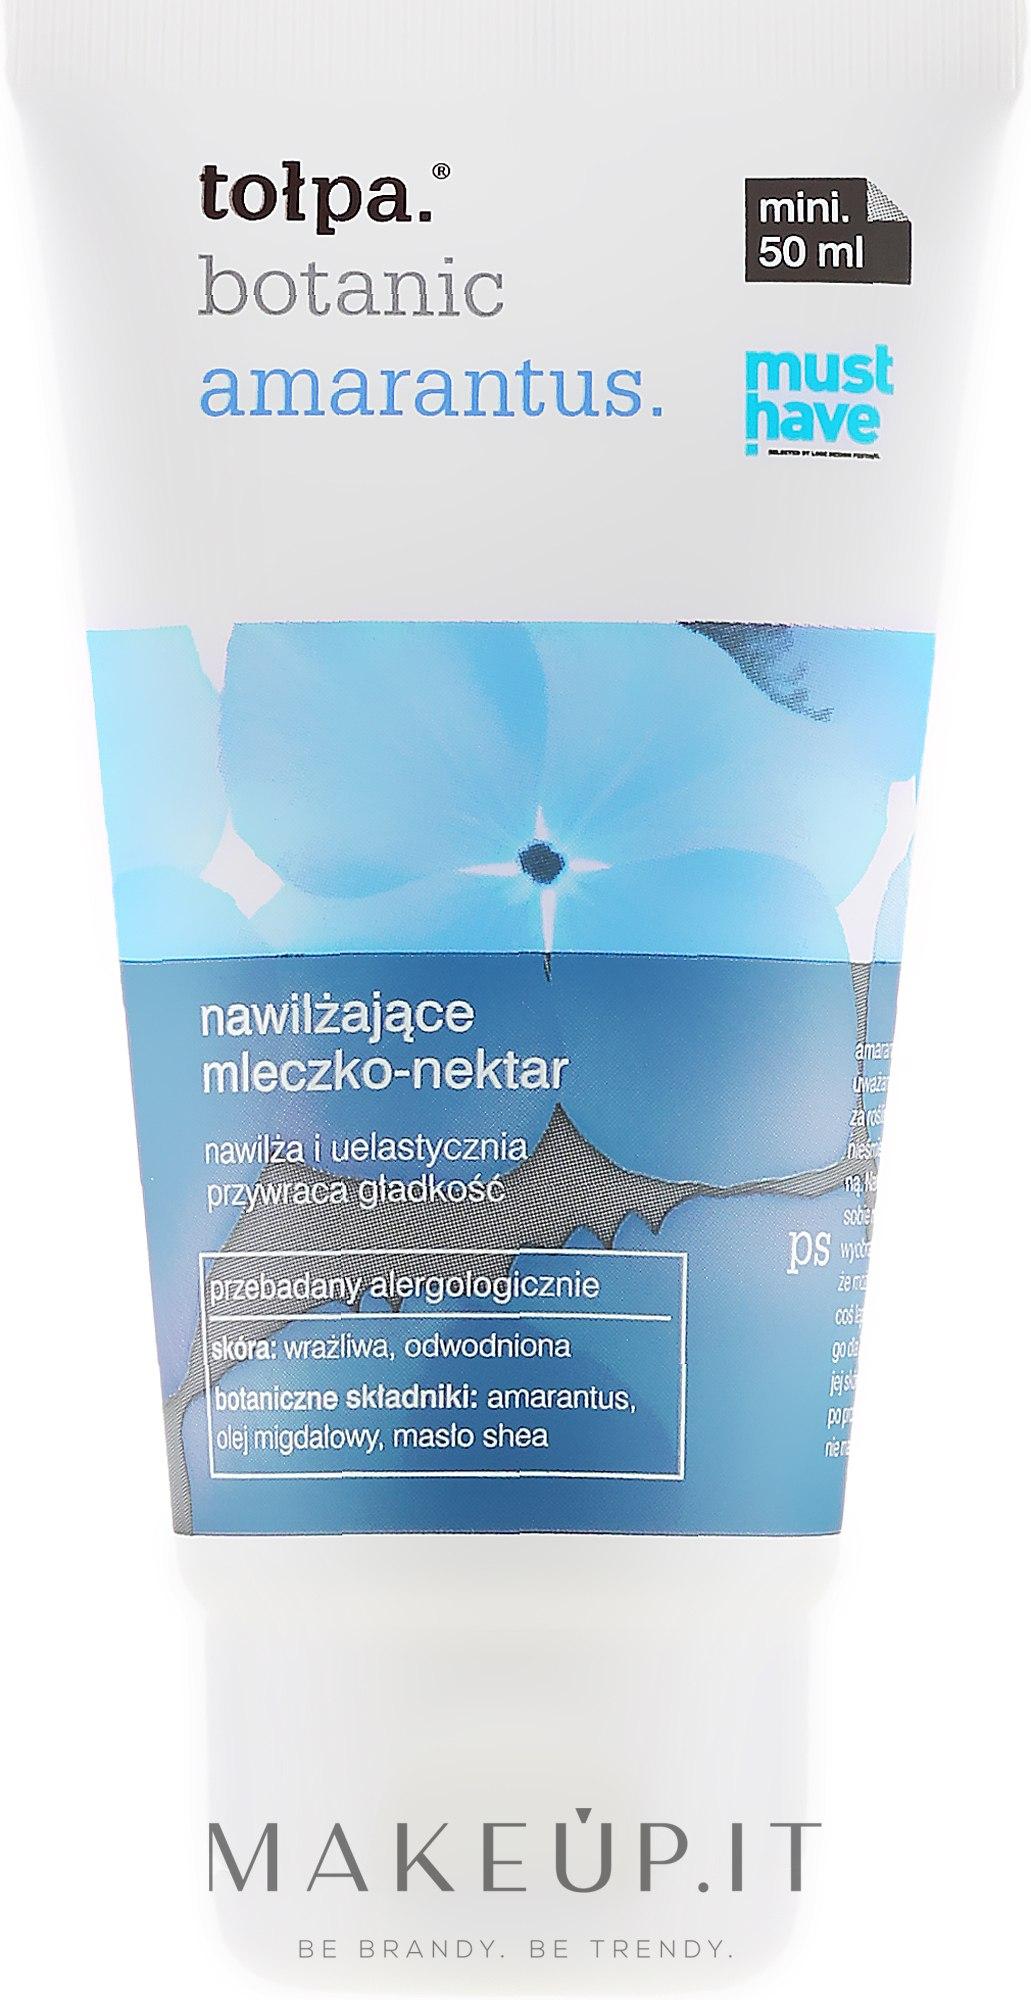 Latte corpo idratante - Tolpa Botanic Amarantus Body Milk — foto 50 ml